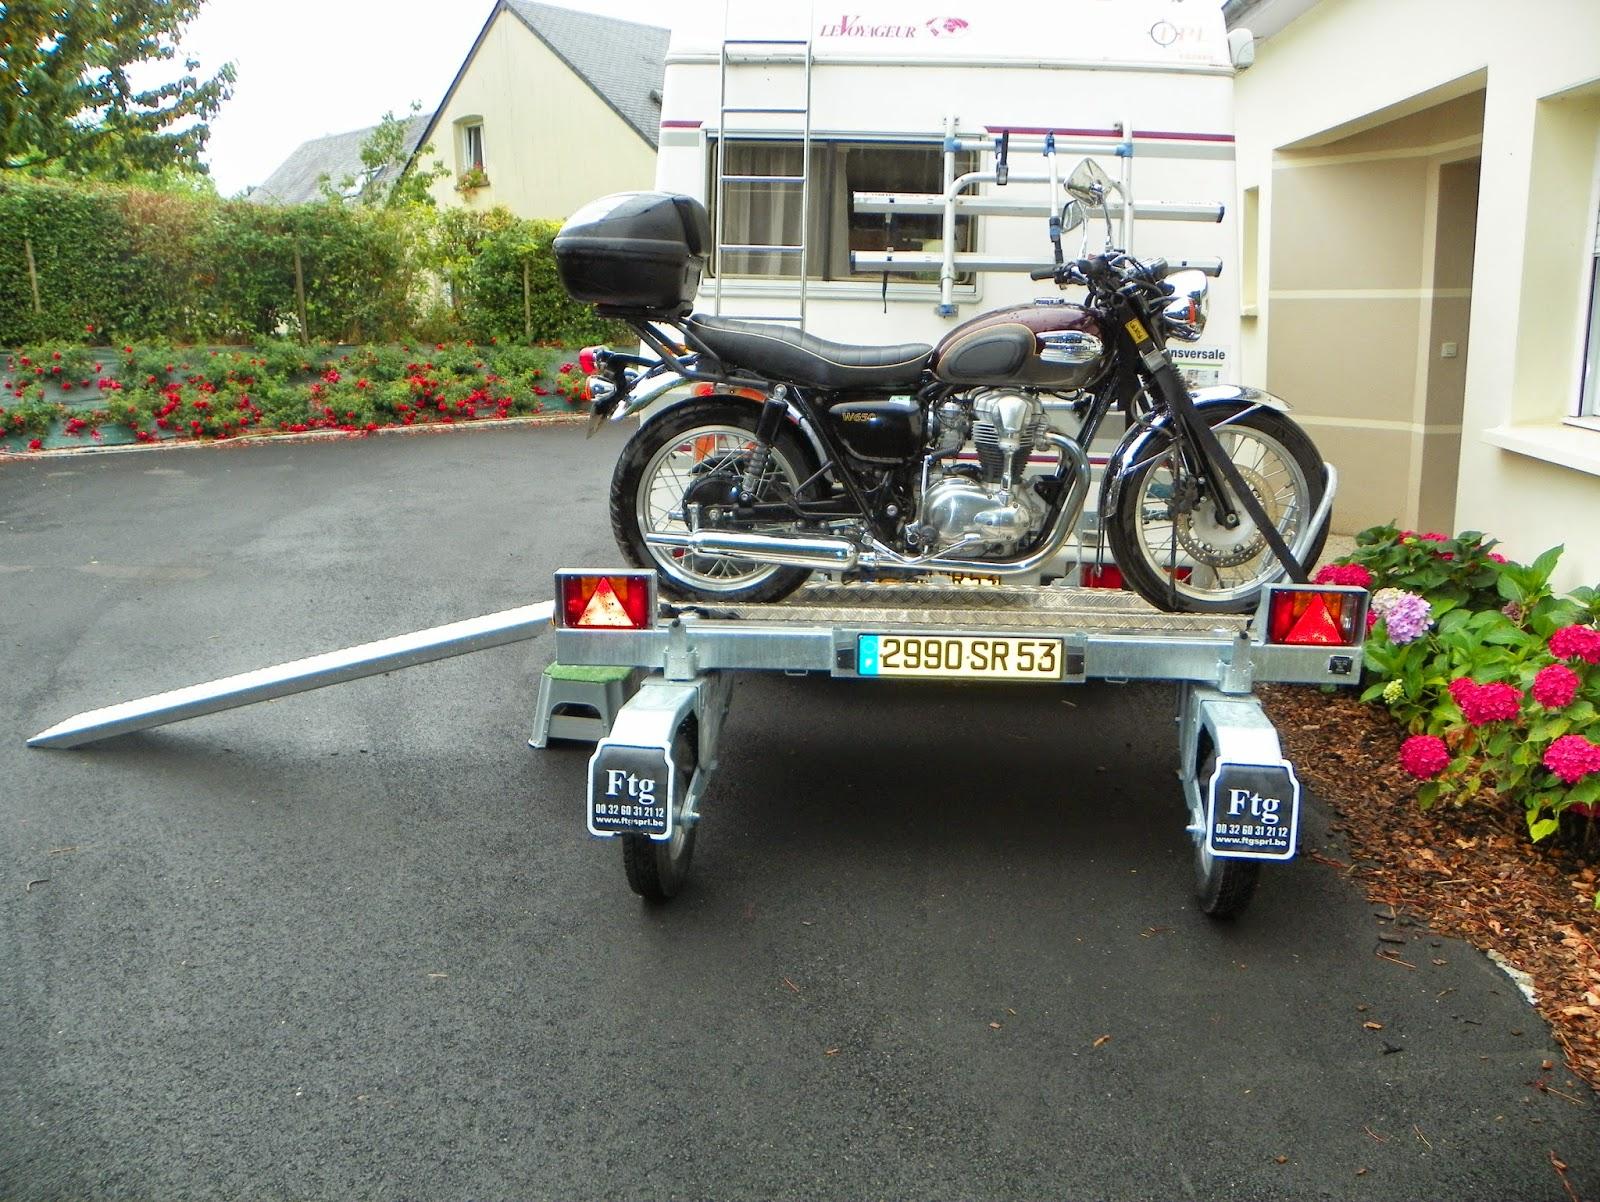 remorque transversale moto pour camping car pas cher 123 remorque. Black Bedroom Furniture Sets. Home Design Ideas